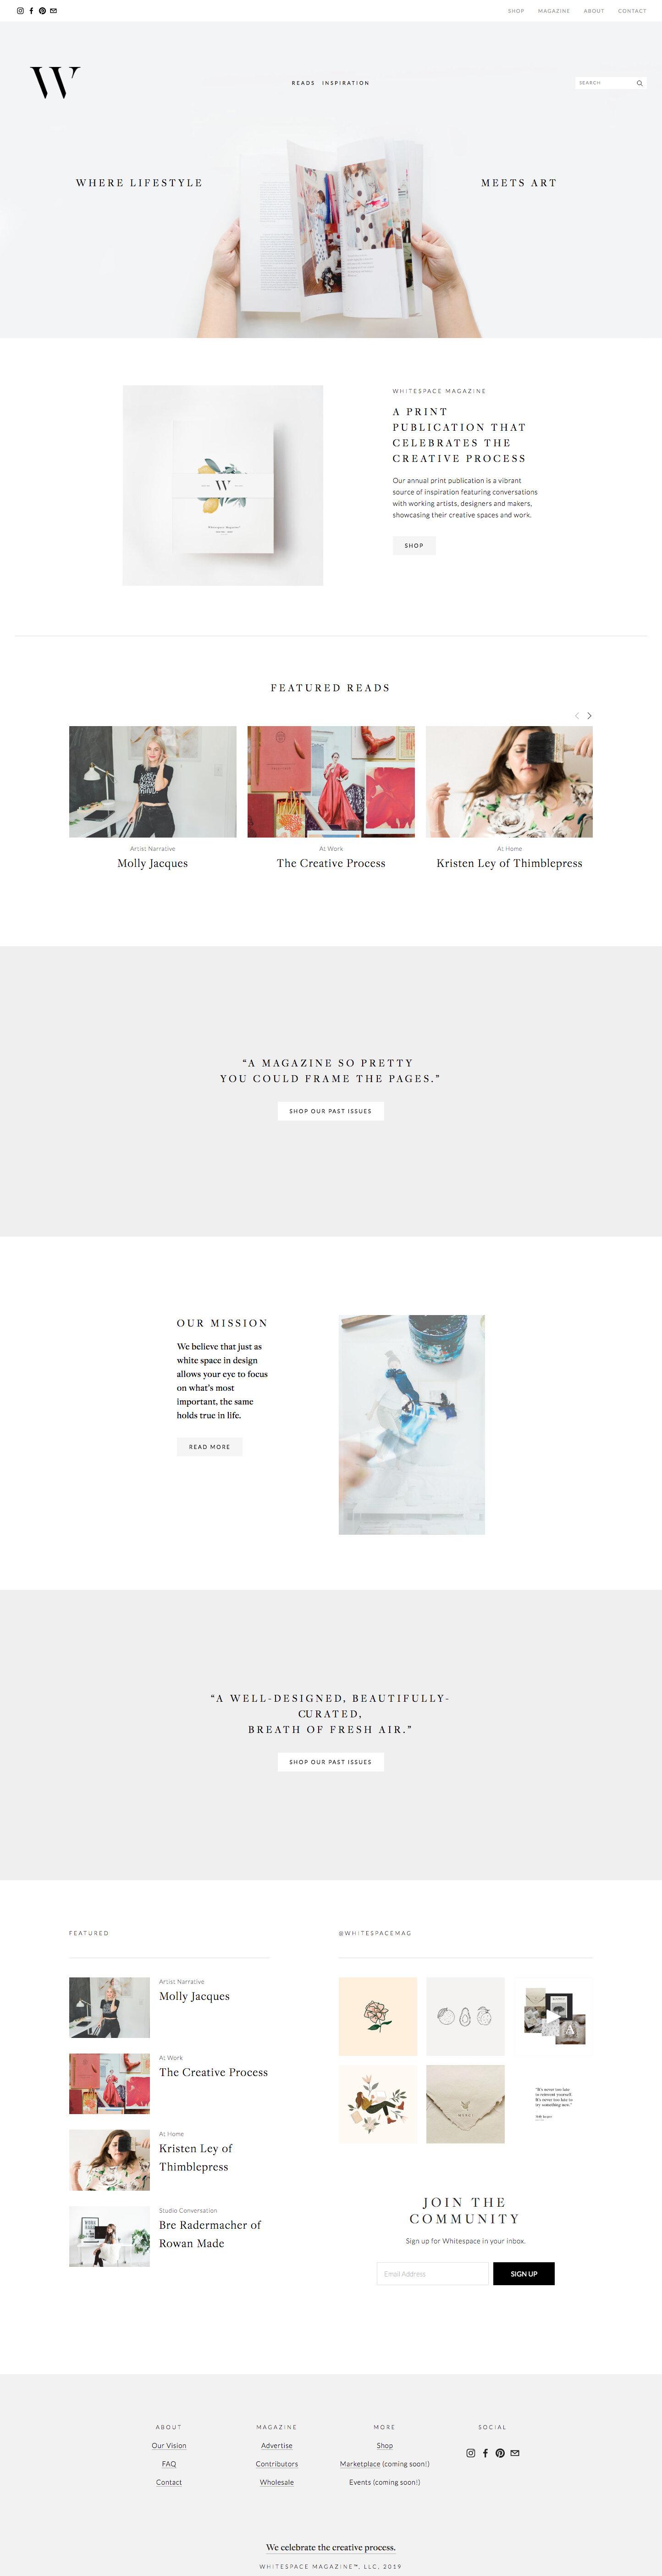 White Space Magazine